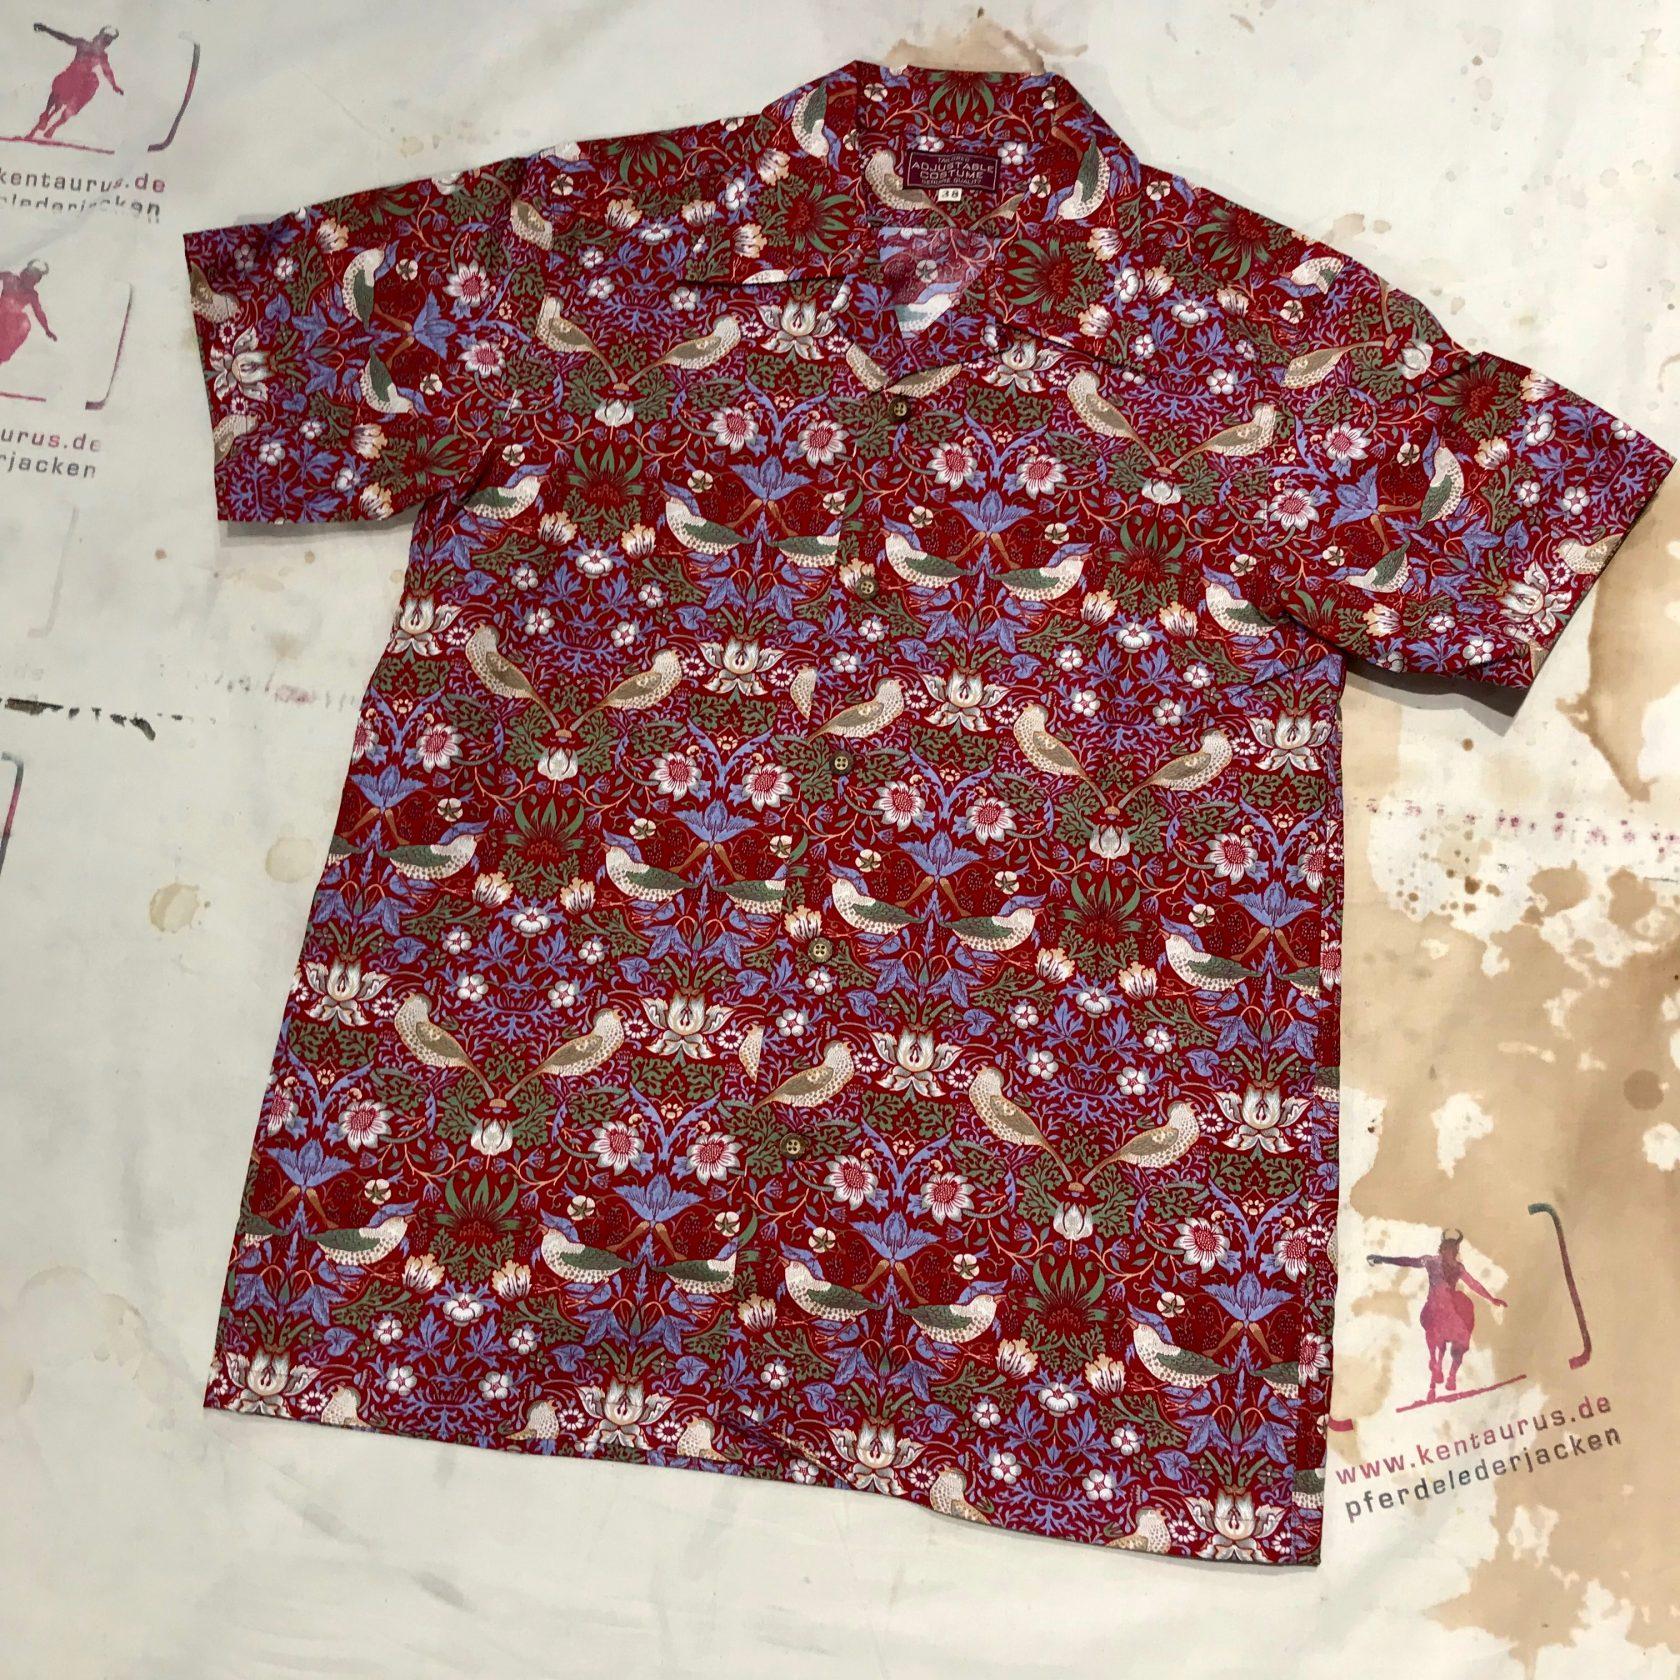 Adjustable Costume open collar shirt red